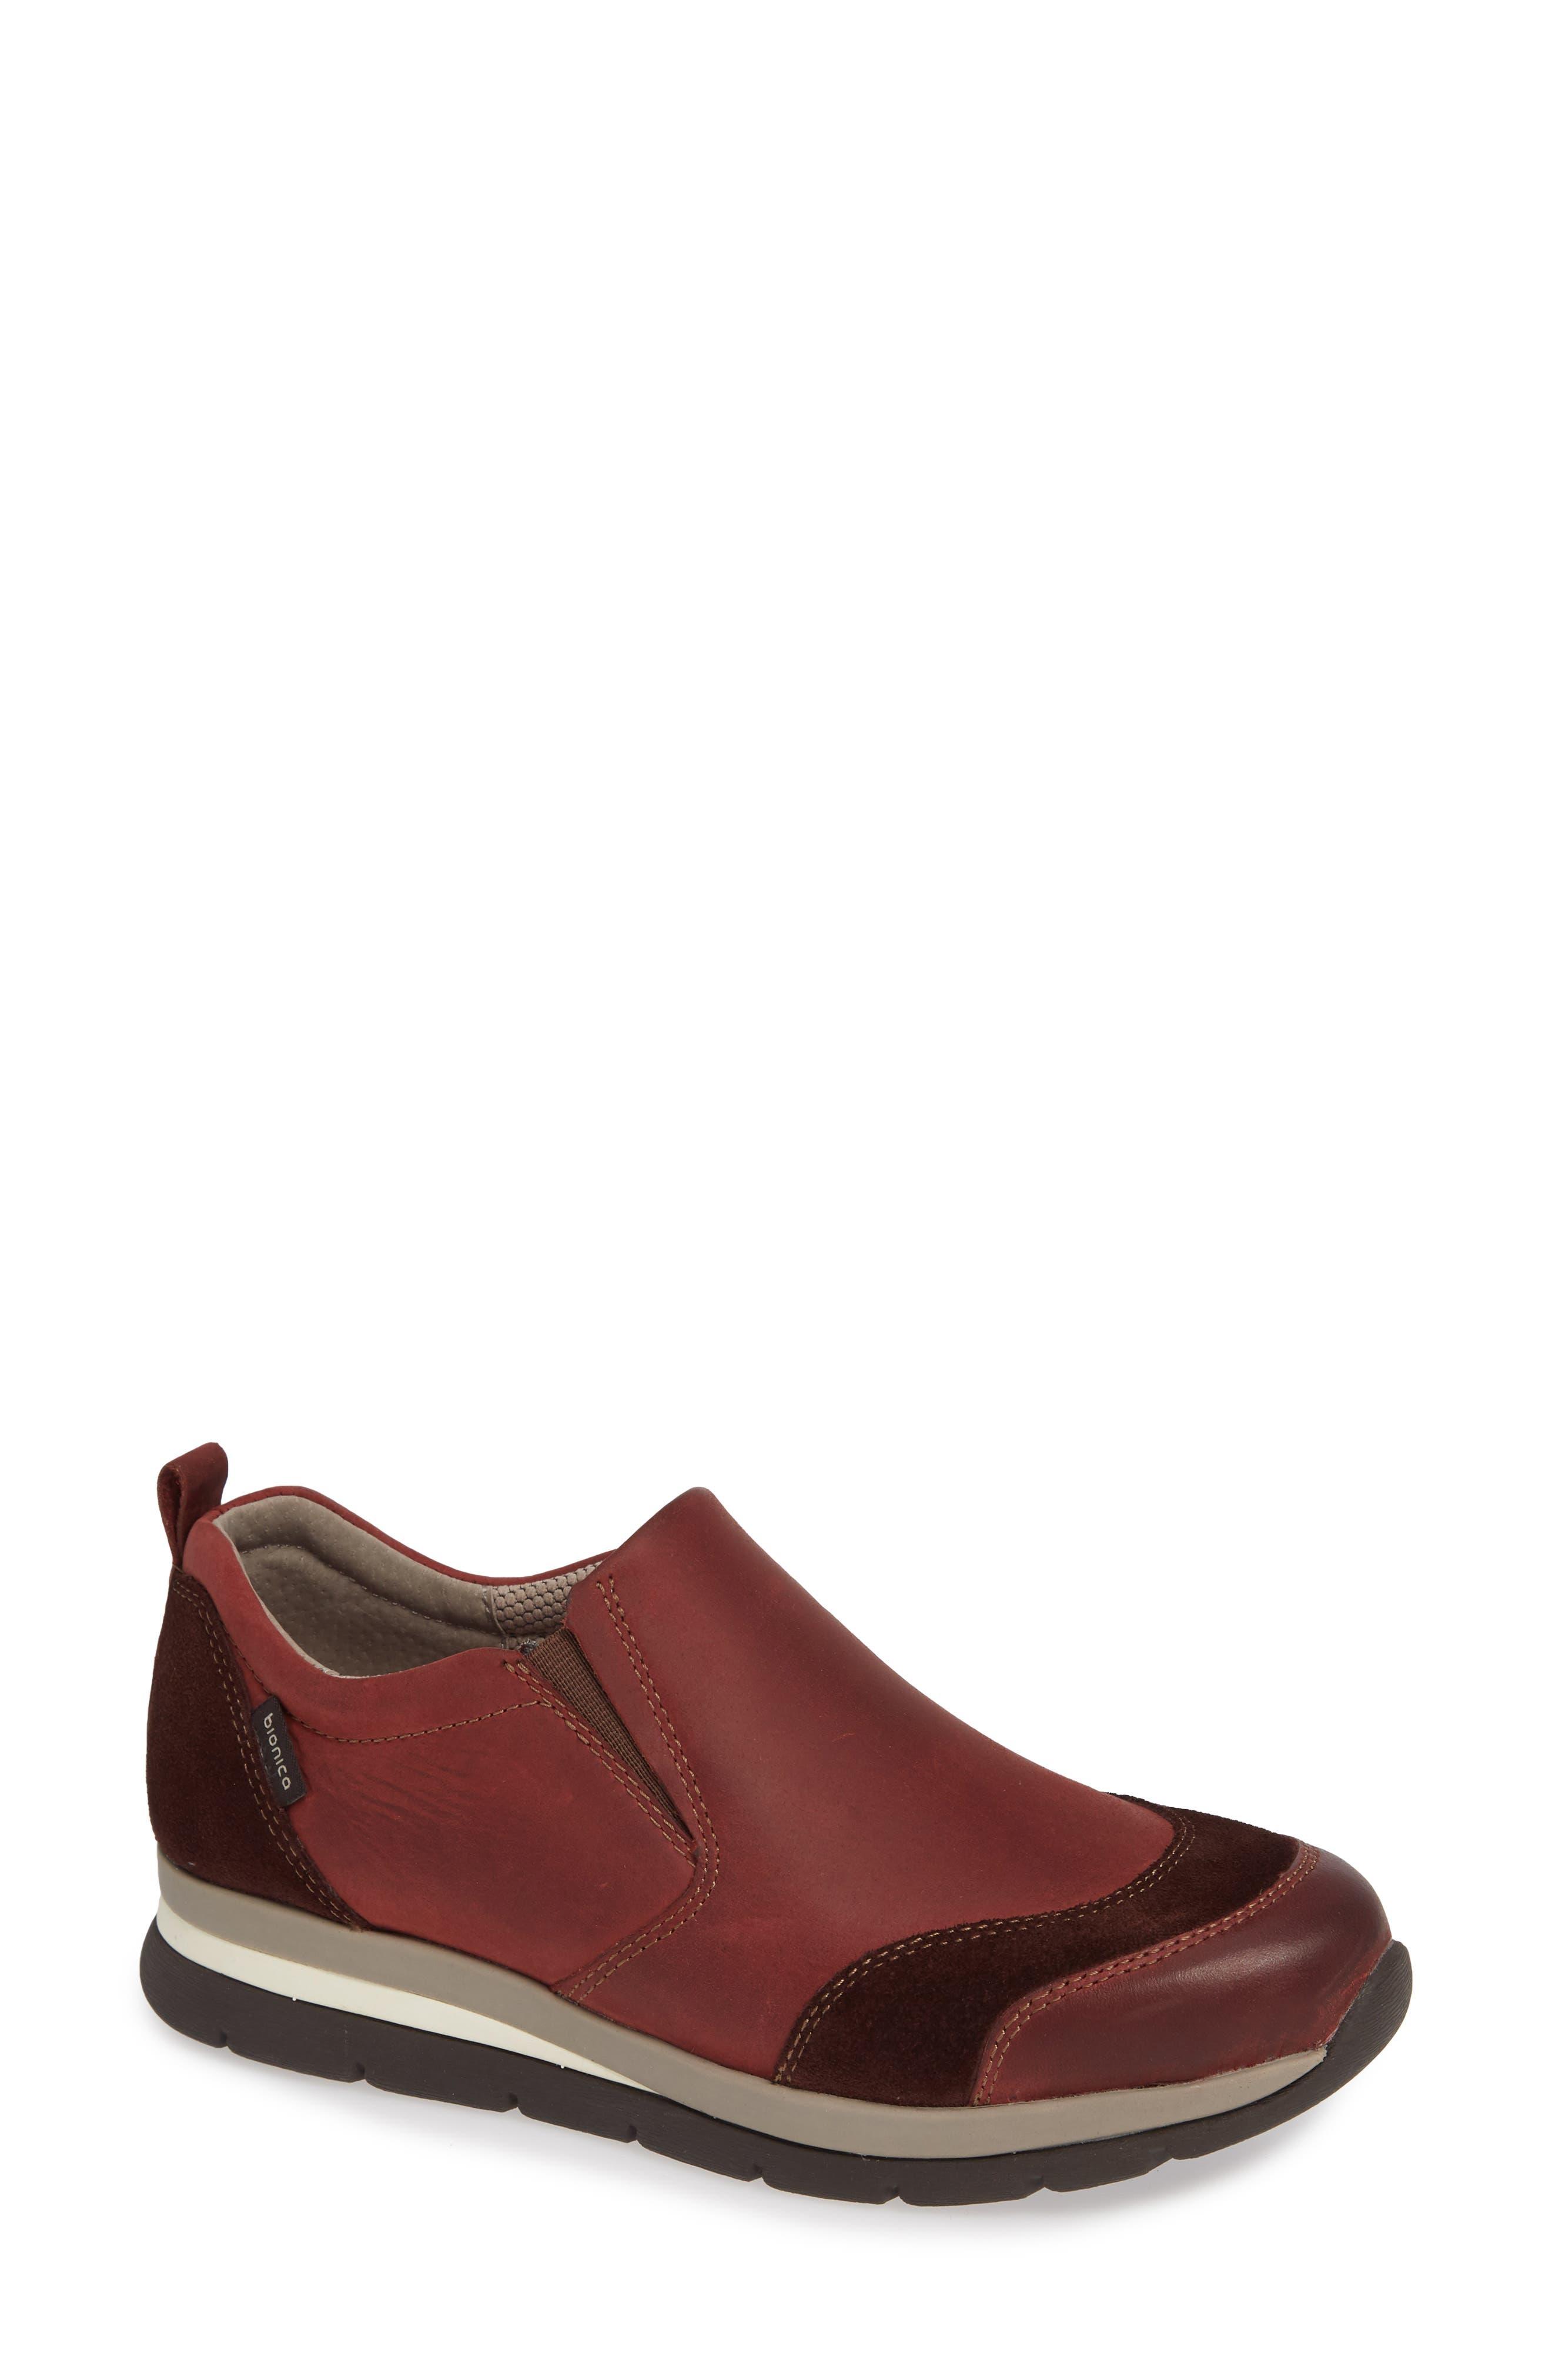 Bionica Talma Waterproof Slip-On Sneaker- Burgundy